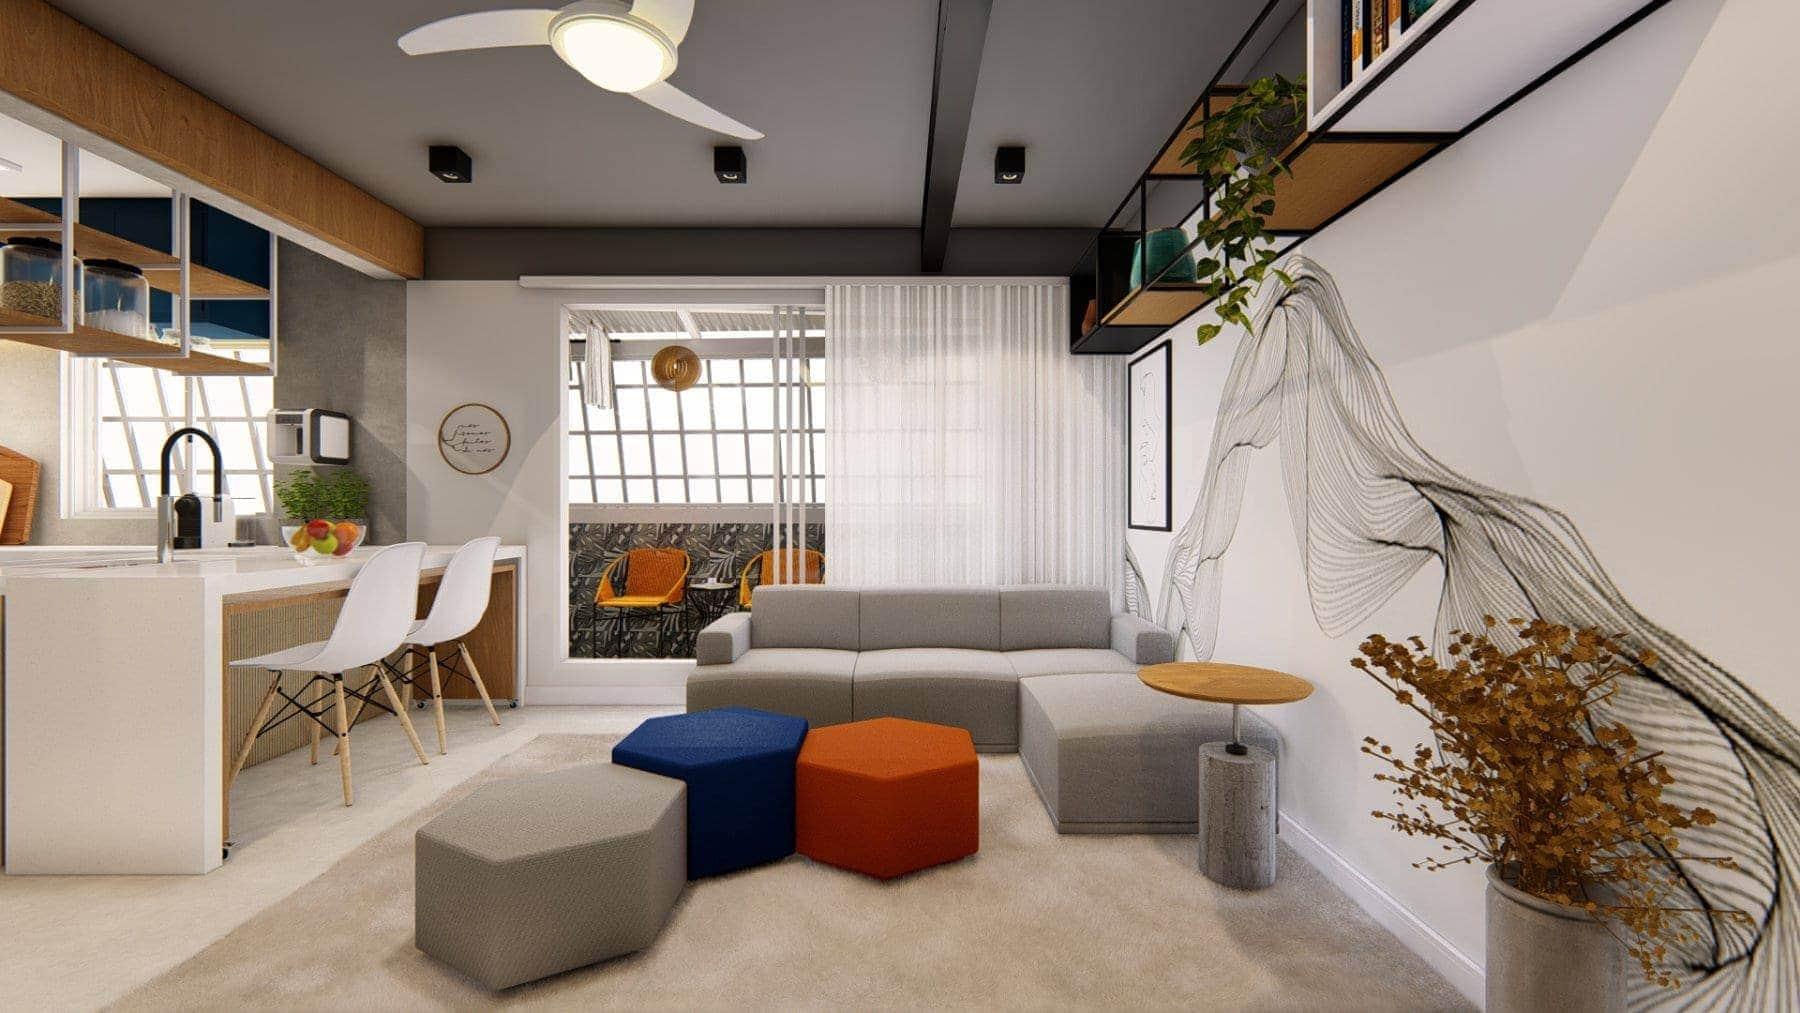 Projeto Interior - Motirõ Estudio &Bull; - 15 &Bull; Deezign